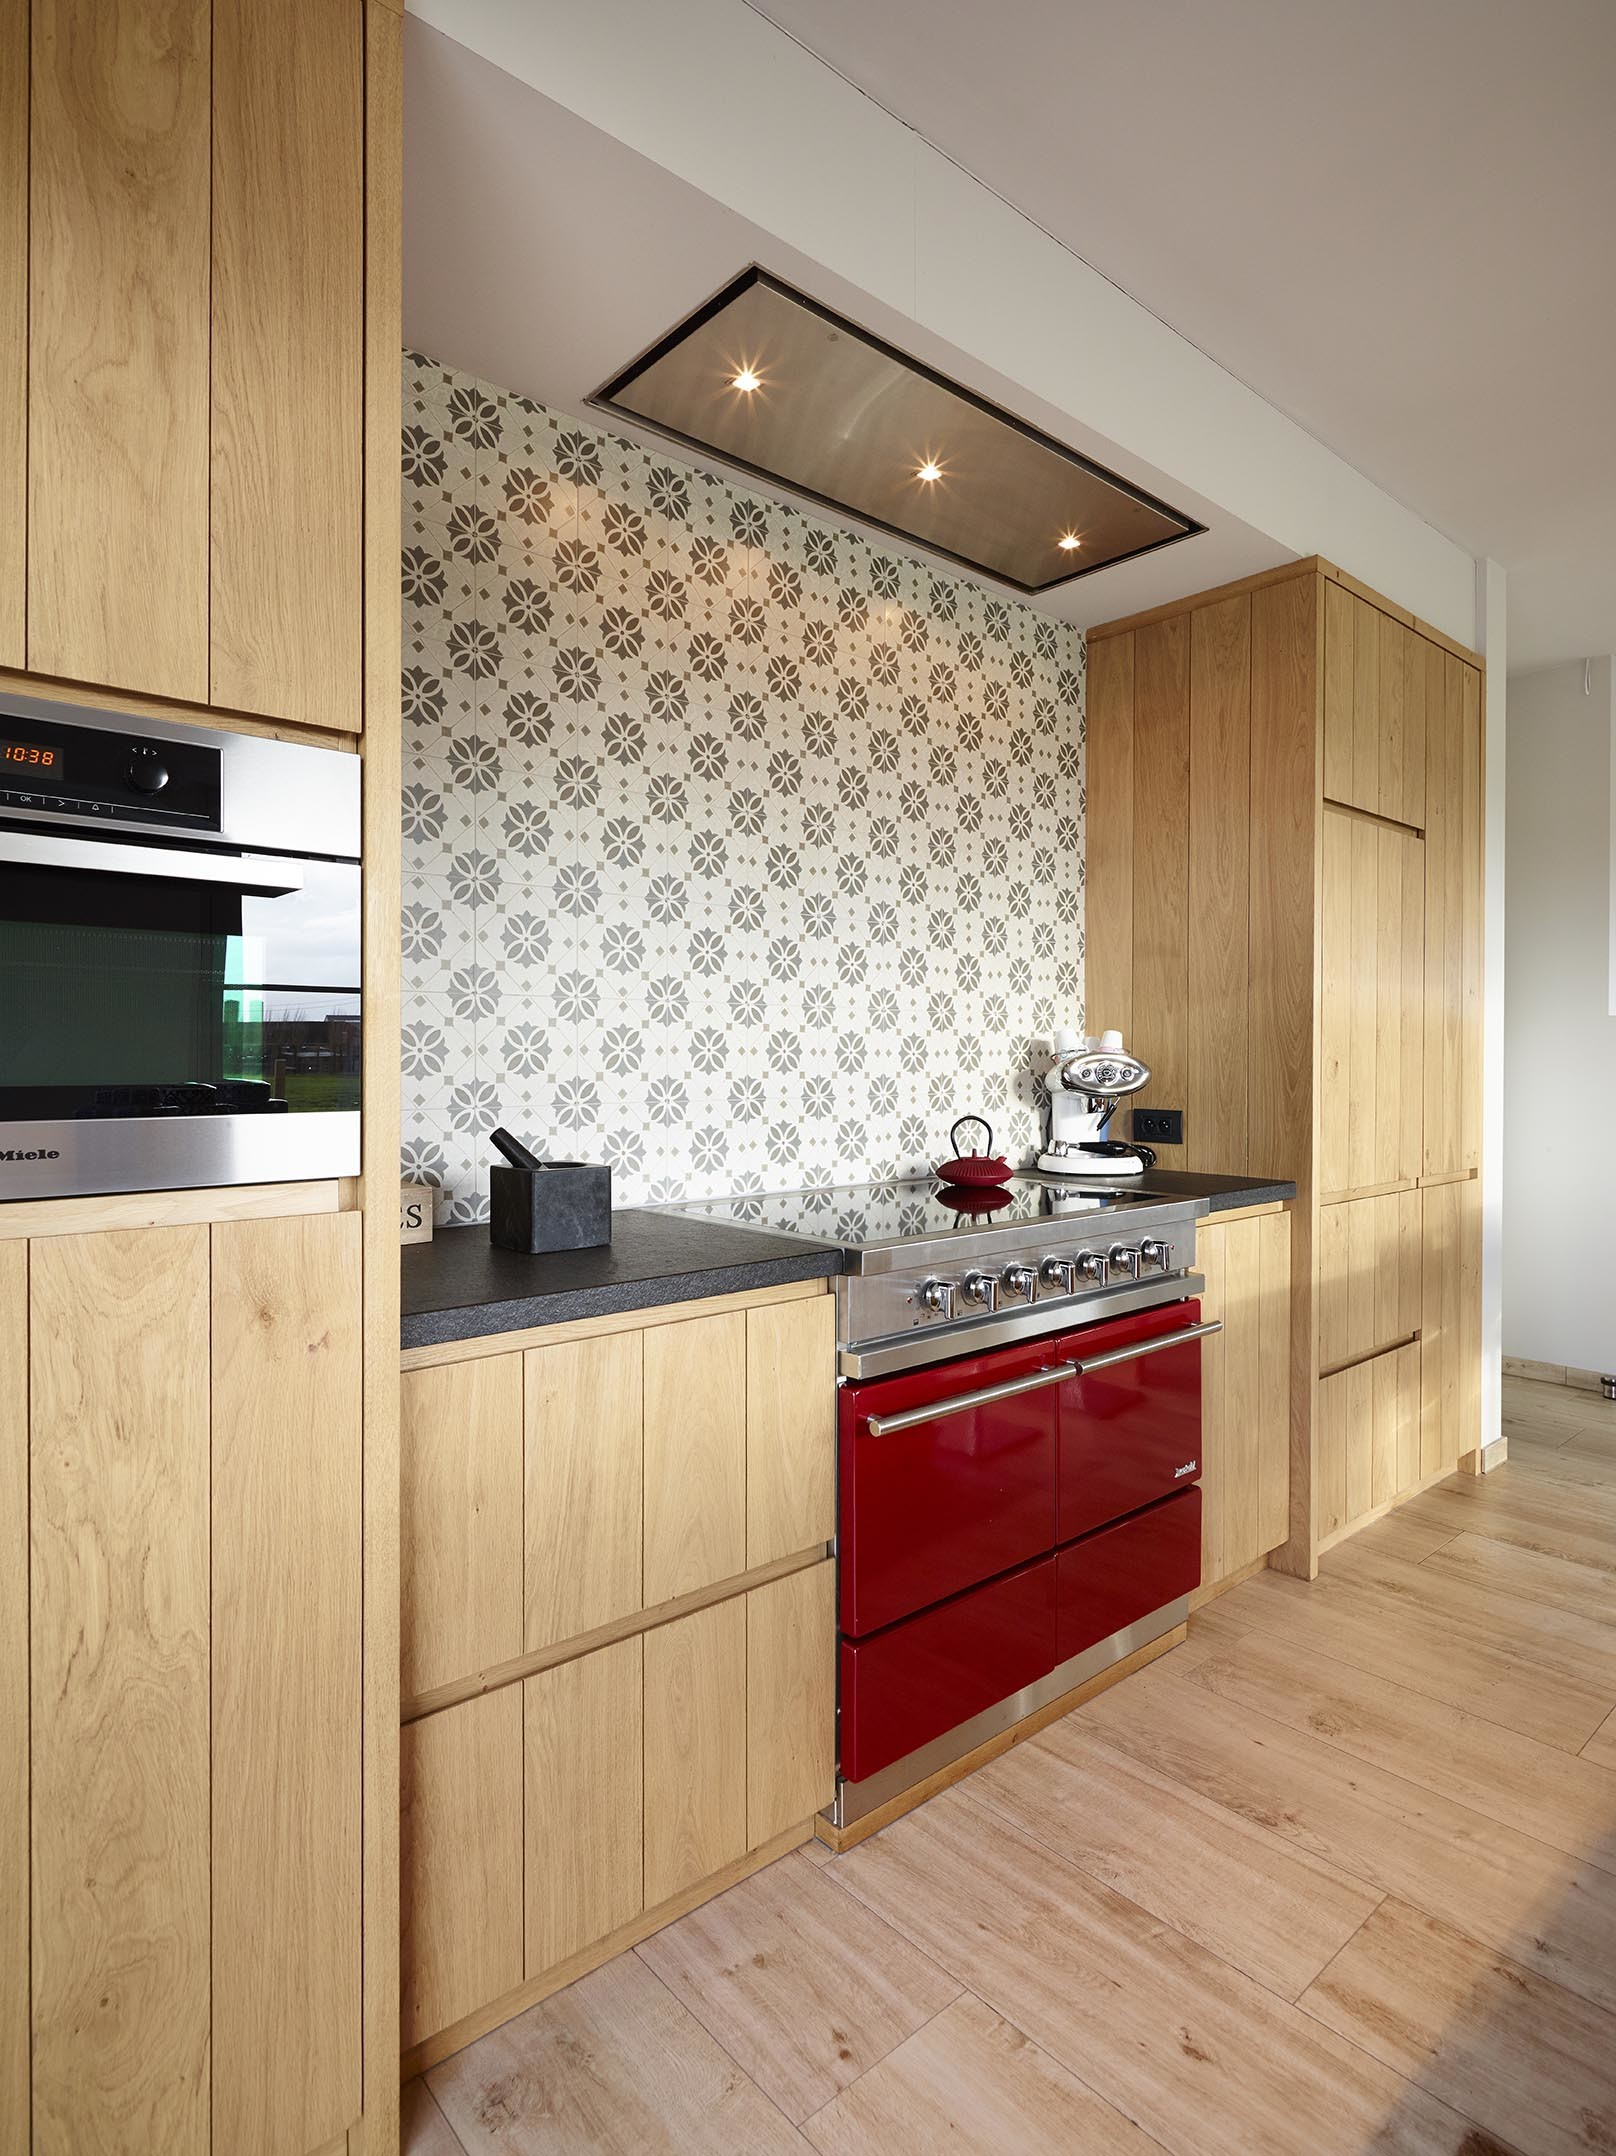 Keuken Eiken Modern : Keuken Modern Eiken Pictures to pin on Pinterest